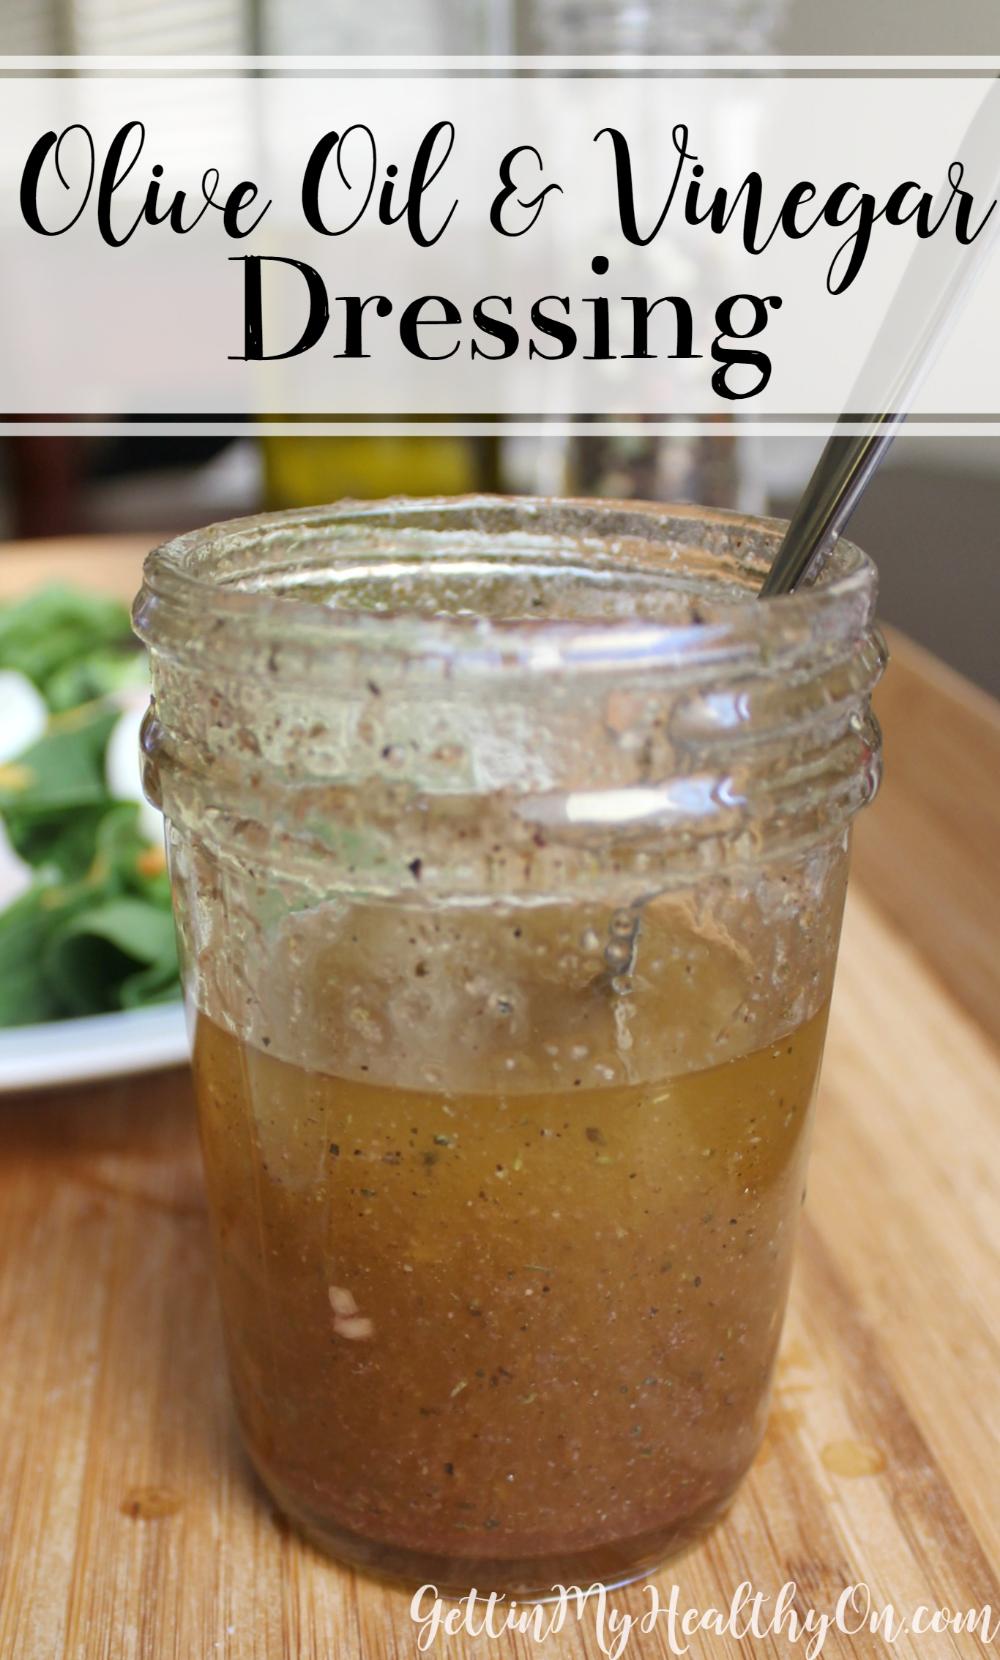 Olive Oil Vinegar Dressing Recipe In 2021 Oil Vinegar Dressing Salad Dressing Recipes Healthy Salad Dressing Recipes Homemade [ 1660 x 1000 Pixel ]